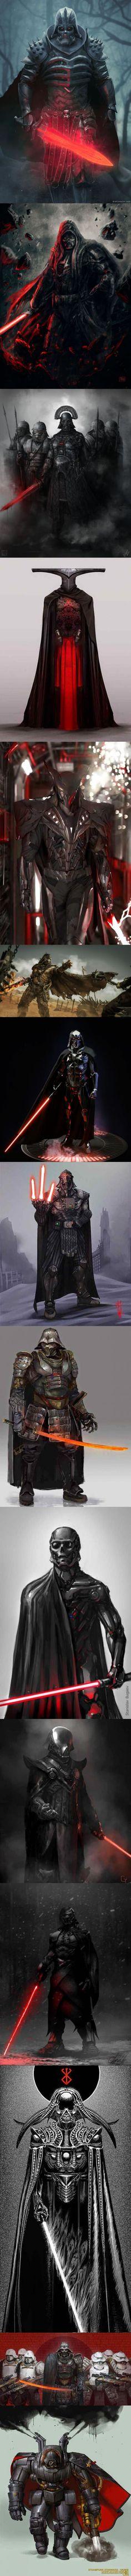 Fan Art Reimagined Darth Vader                                                                                                                                                                                 More